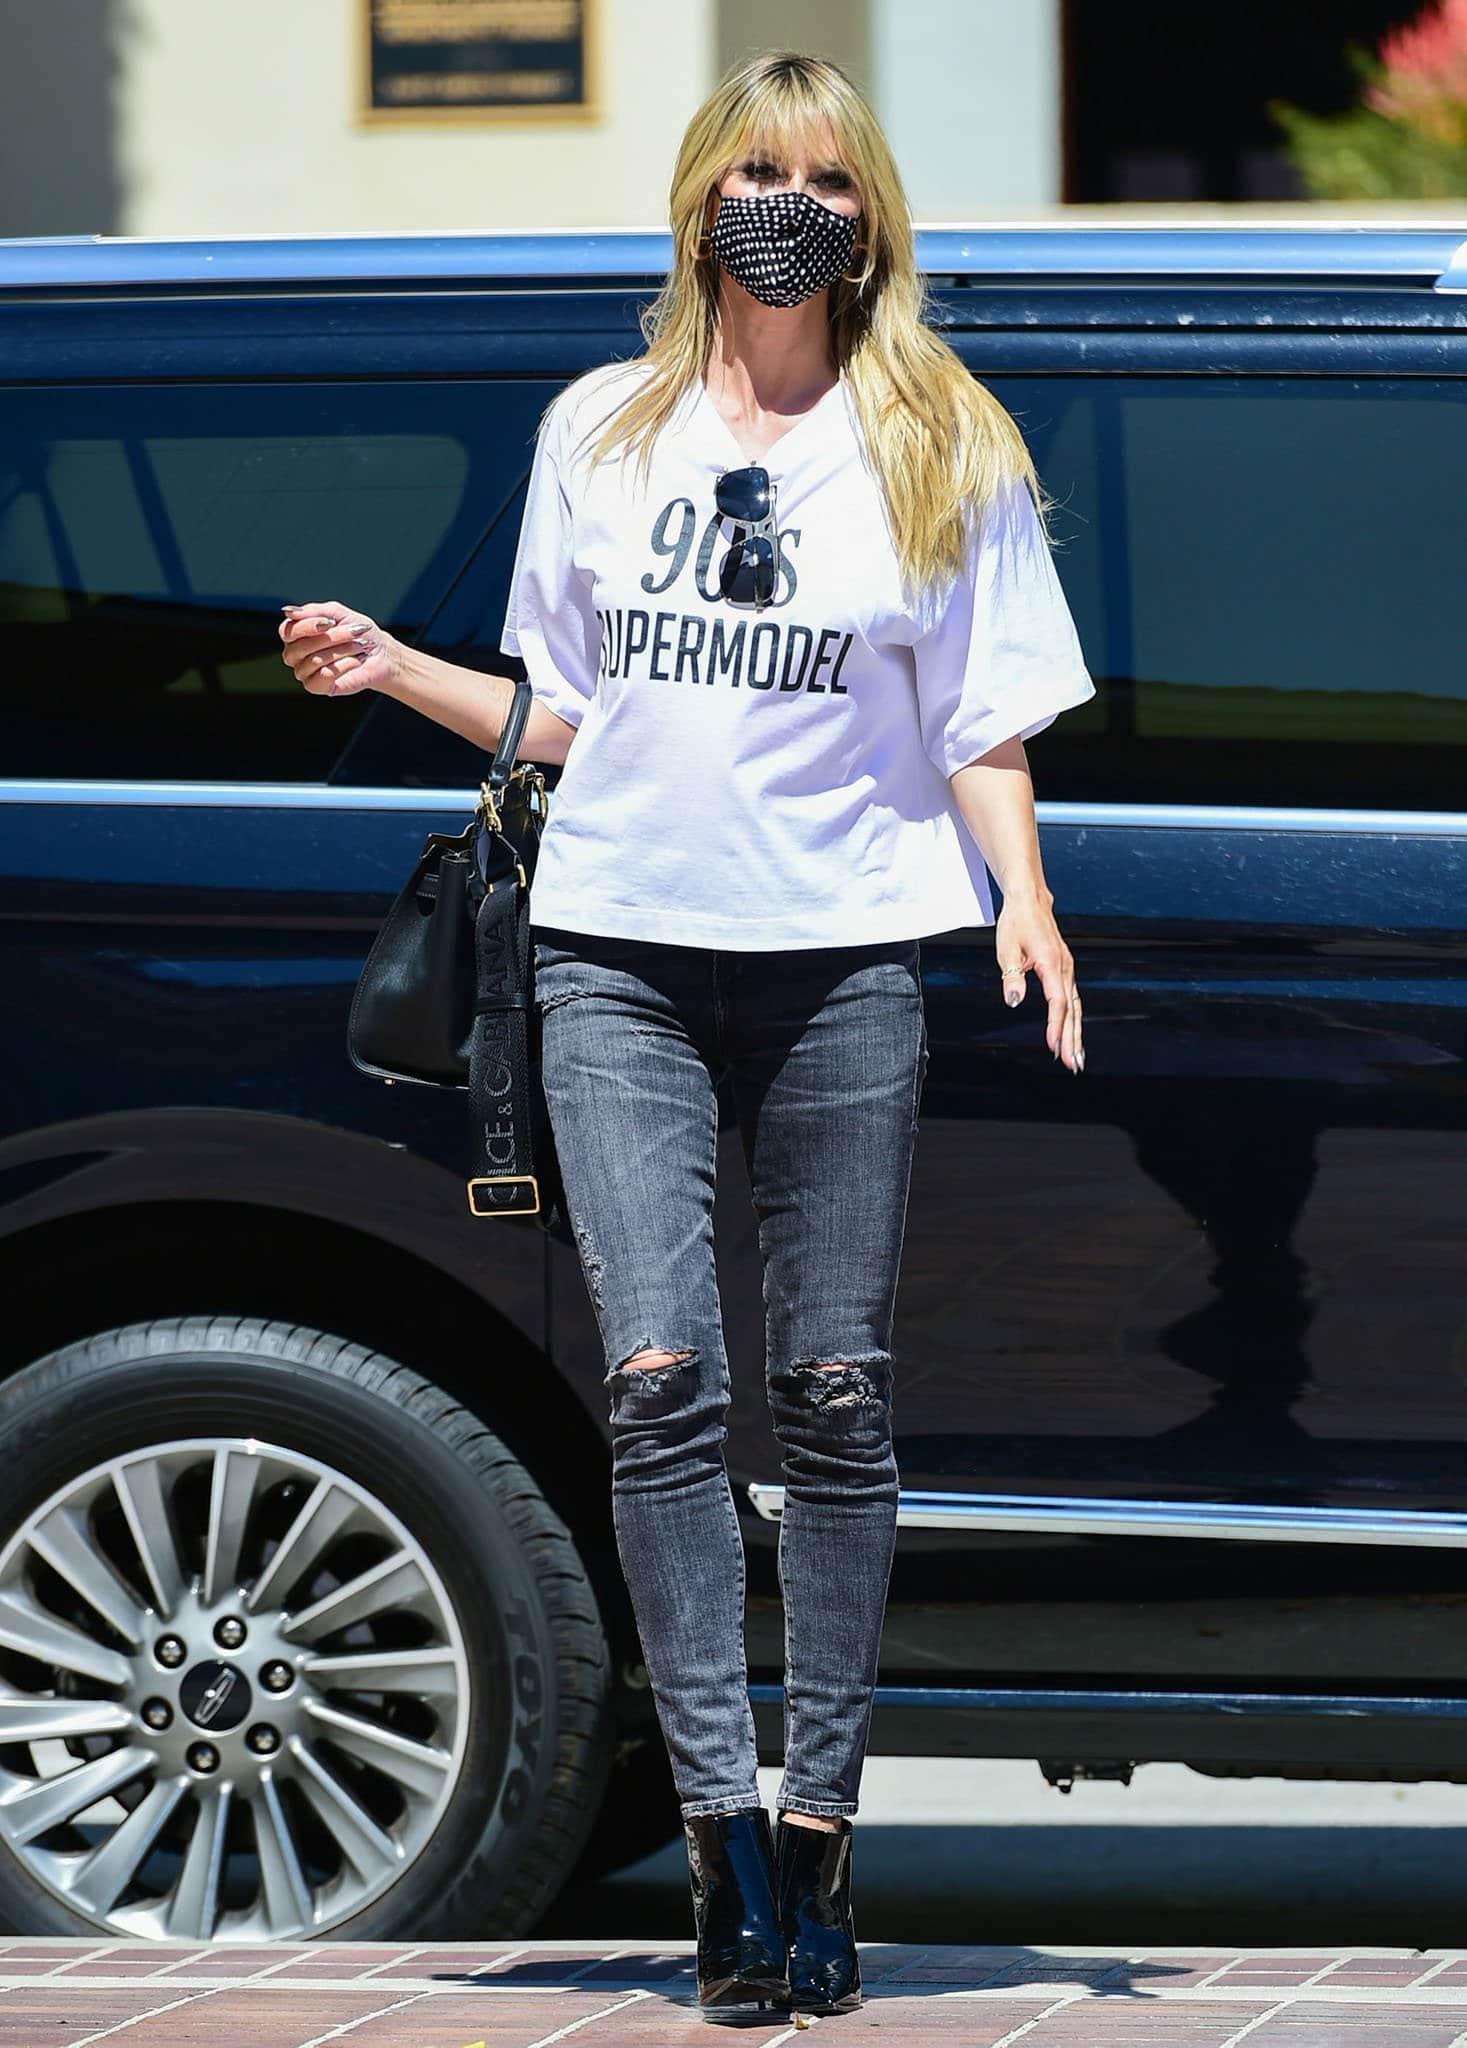 Heidi Klum kicks off America's Got Talent season 16 taping in Dolce & Gabbana '90s Supermodel tee on March 28, 2021